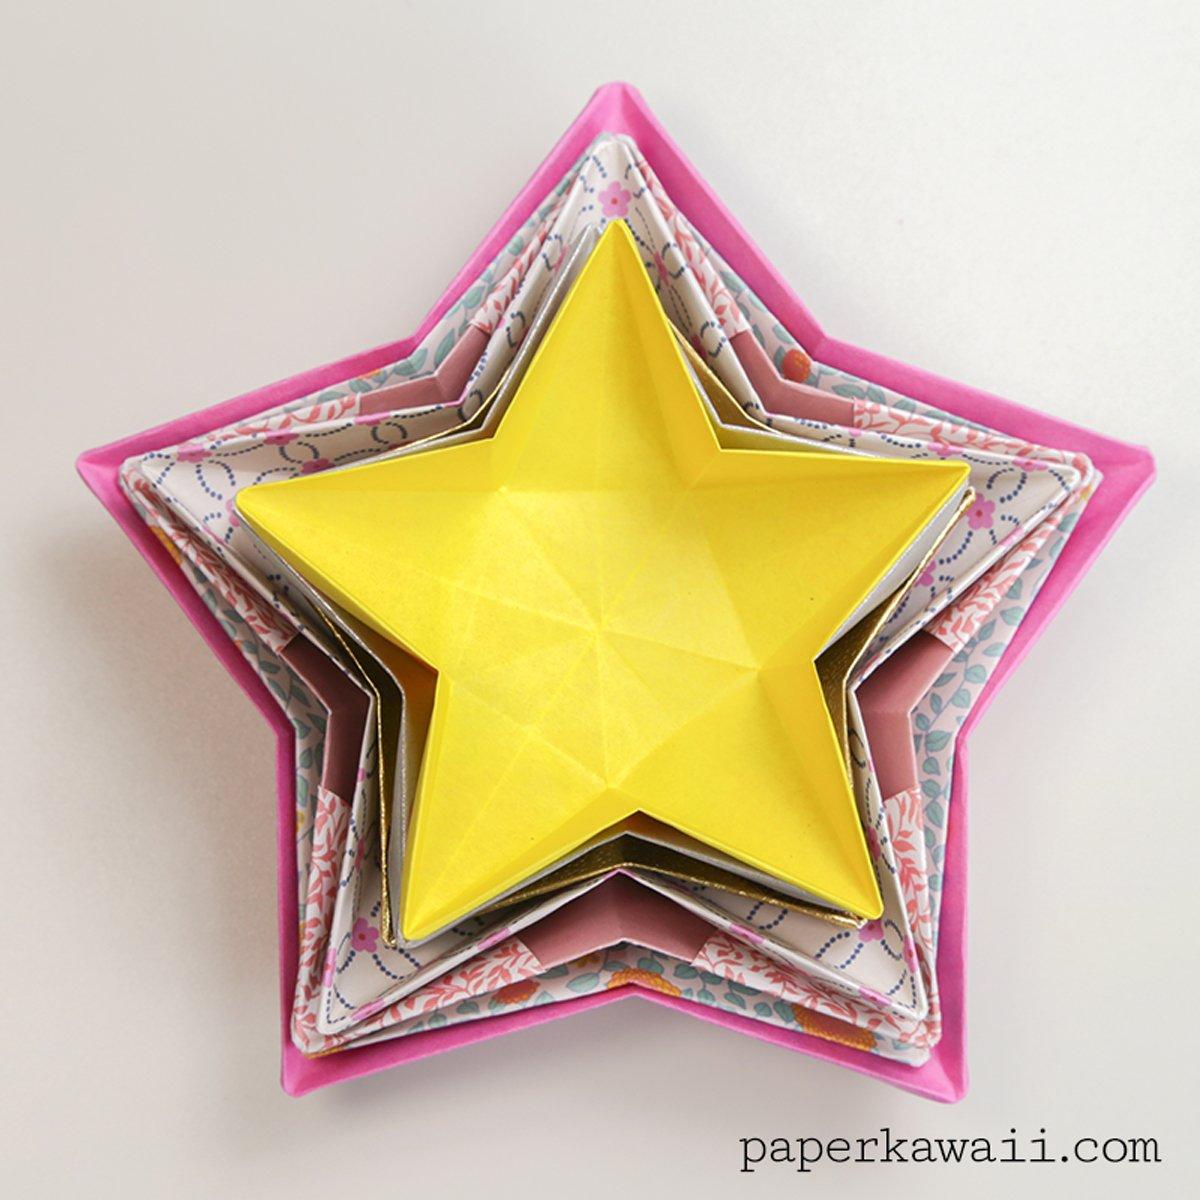 Origami bowl patterns patterns kid origami jeuxipadfo Images